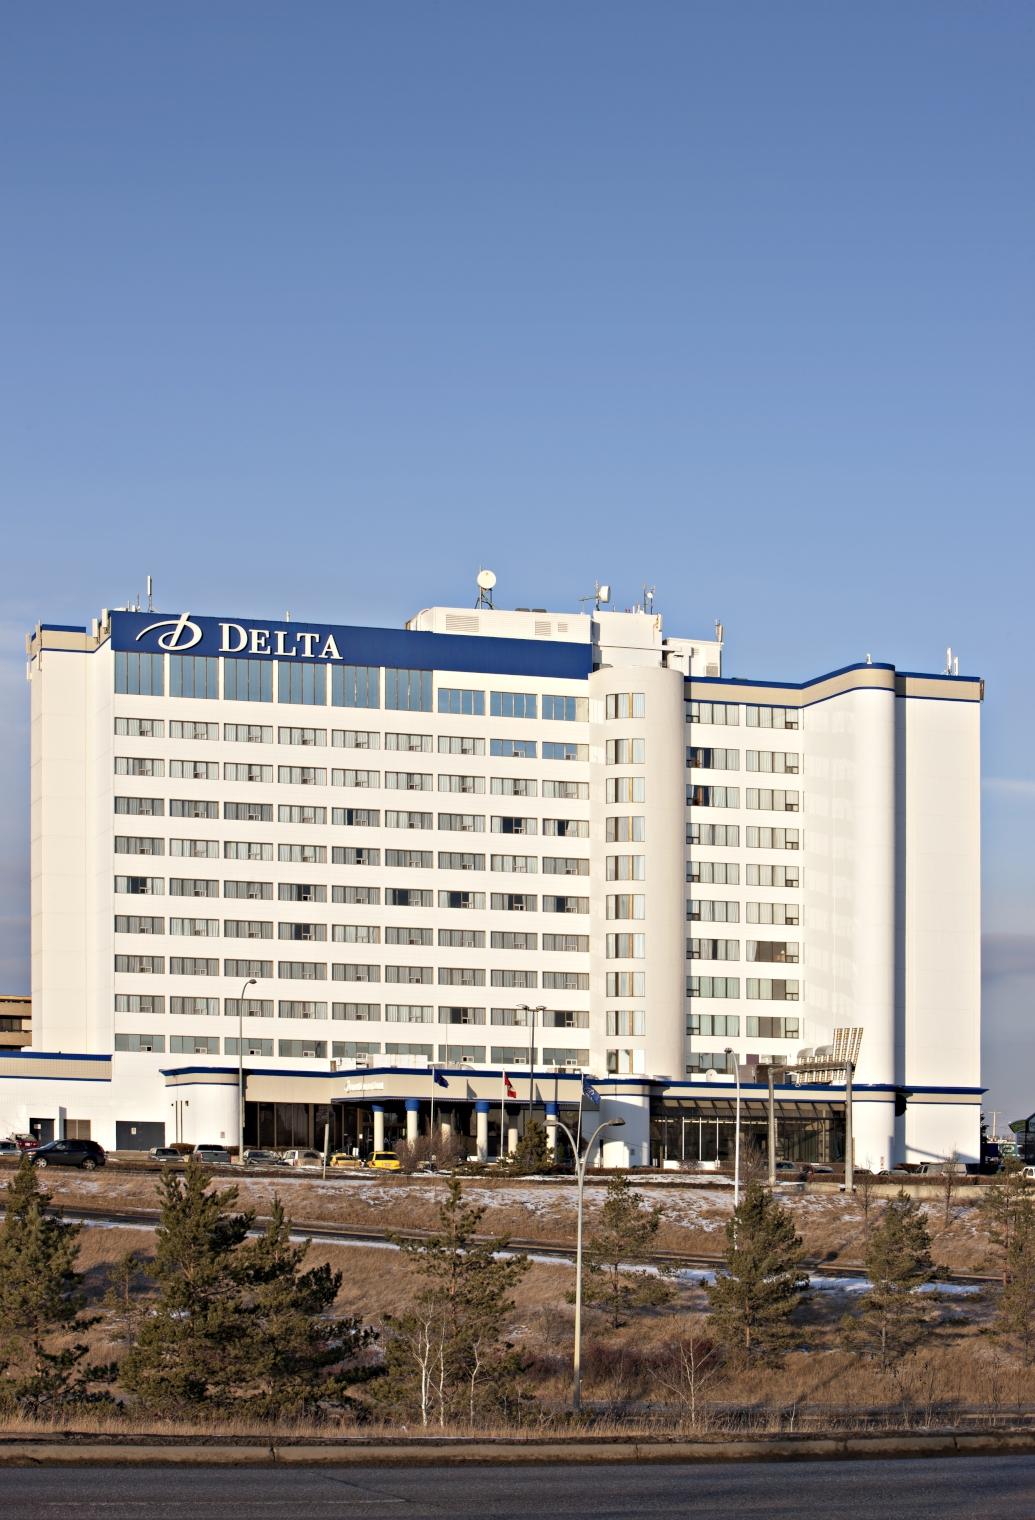 Edmonton: Delta Hotels By Mariott Edmonton South Hotel & Conference